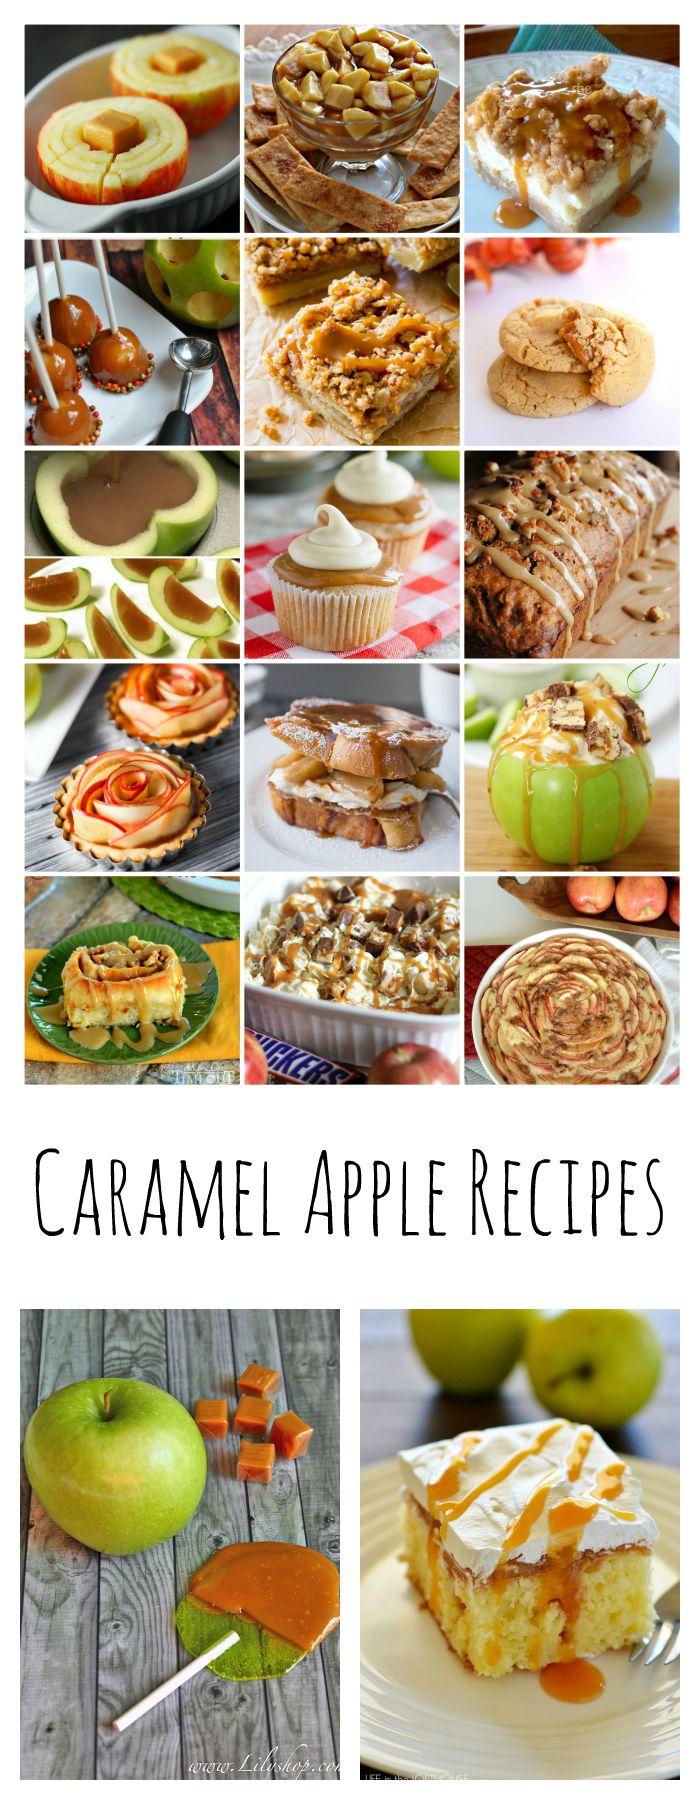 Caramel-Apple-Fall-Recipes